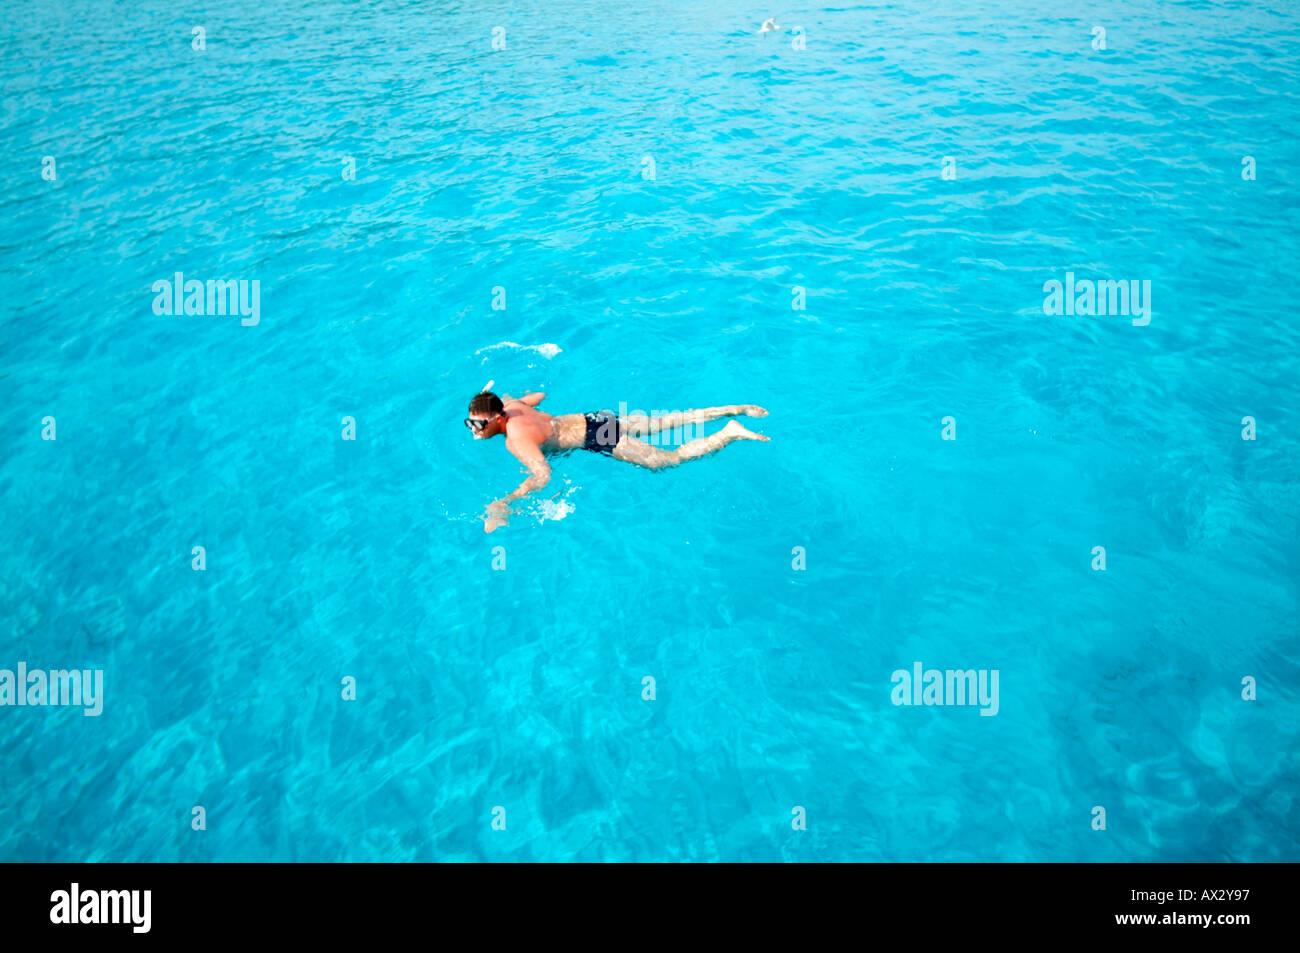 man snorkeling in mediterran Sea - Stock Image